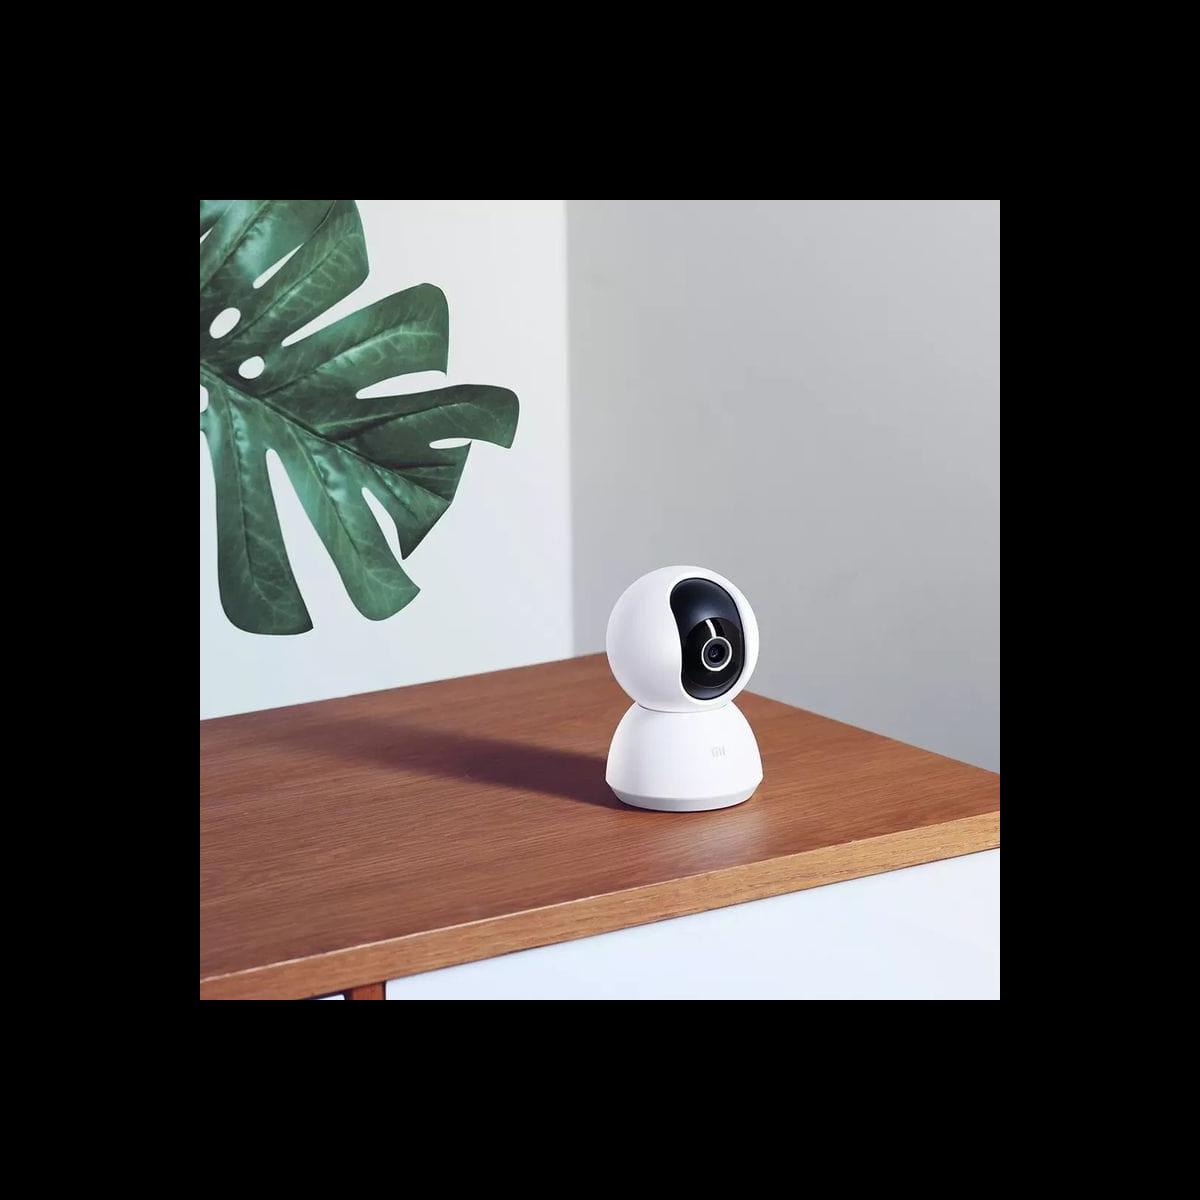 Mi 360° Home Security Camera 2K